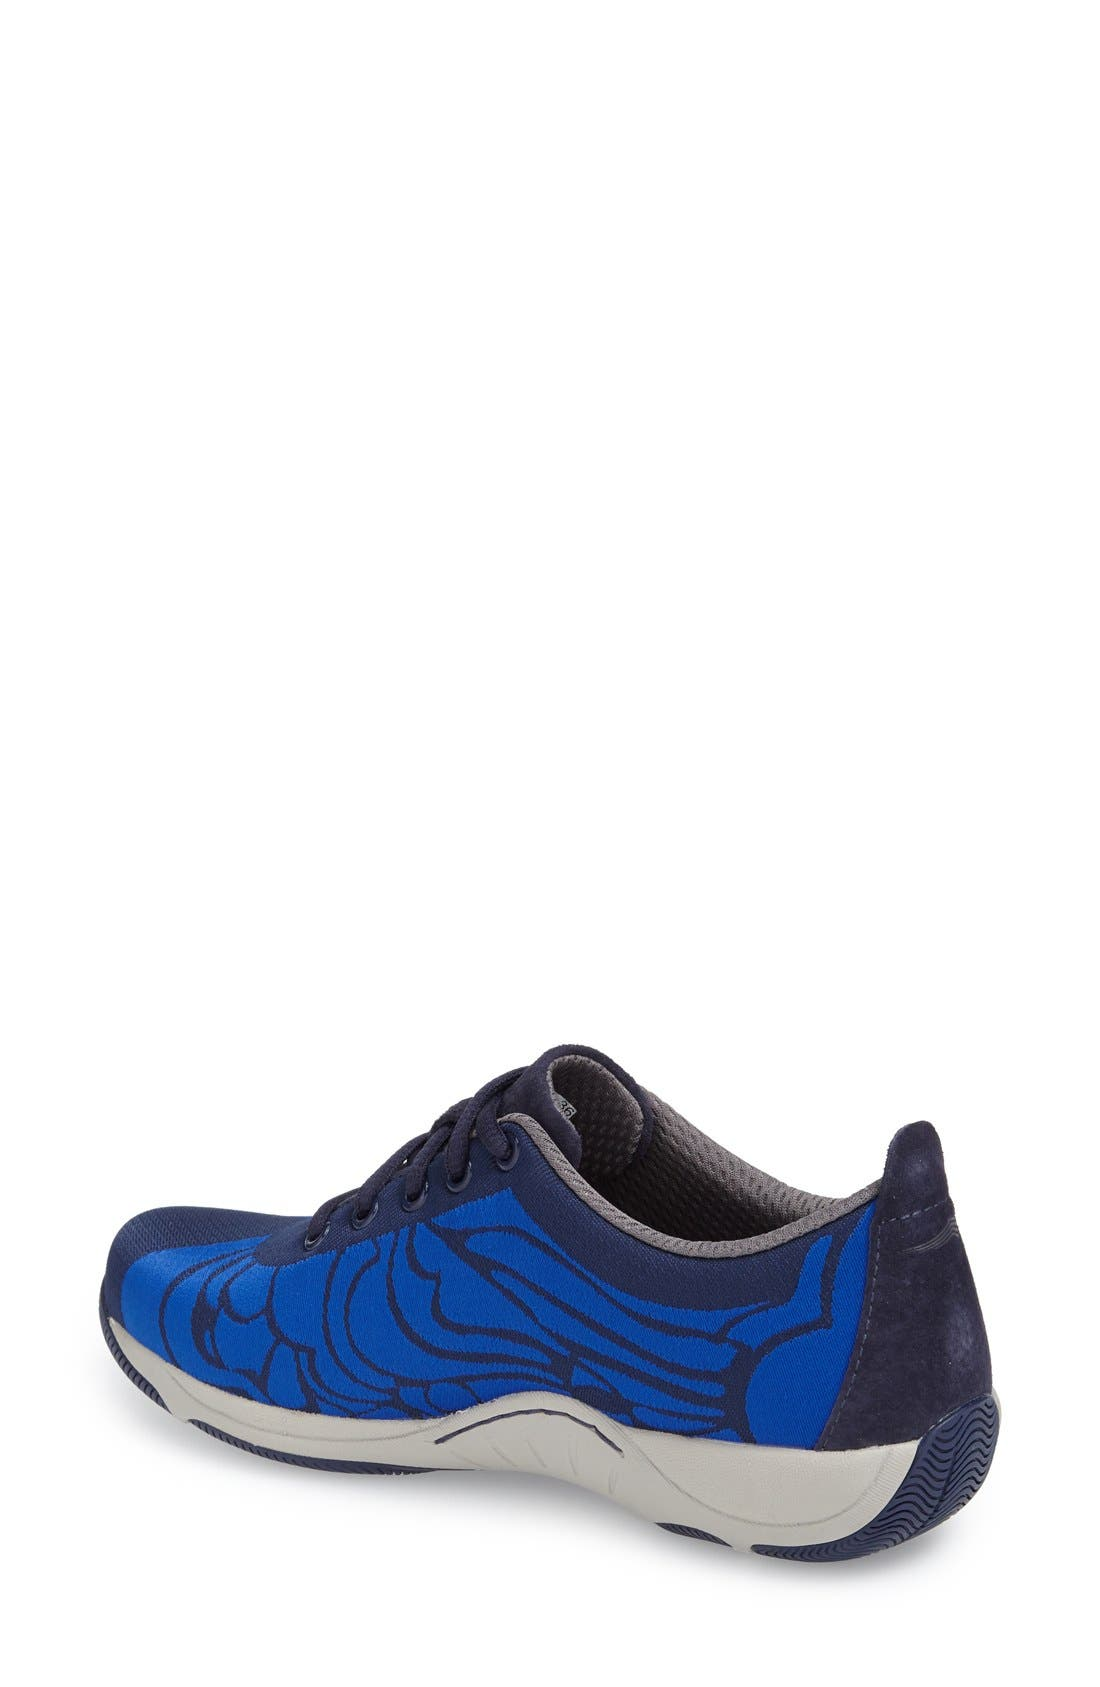 Alternate Image 2  - Dansko 'Hanna' Sneaker (Women)